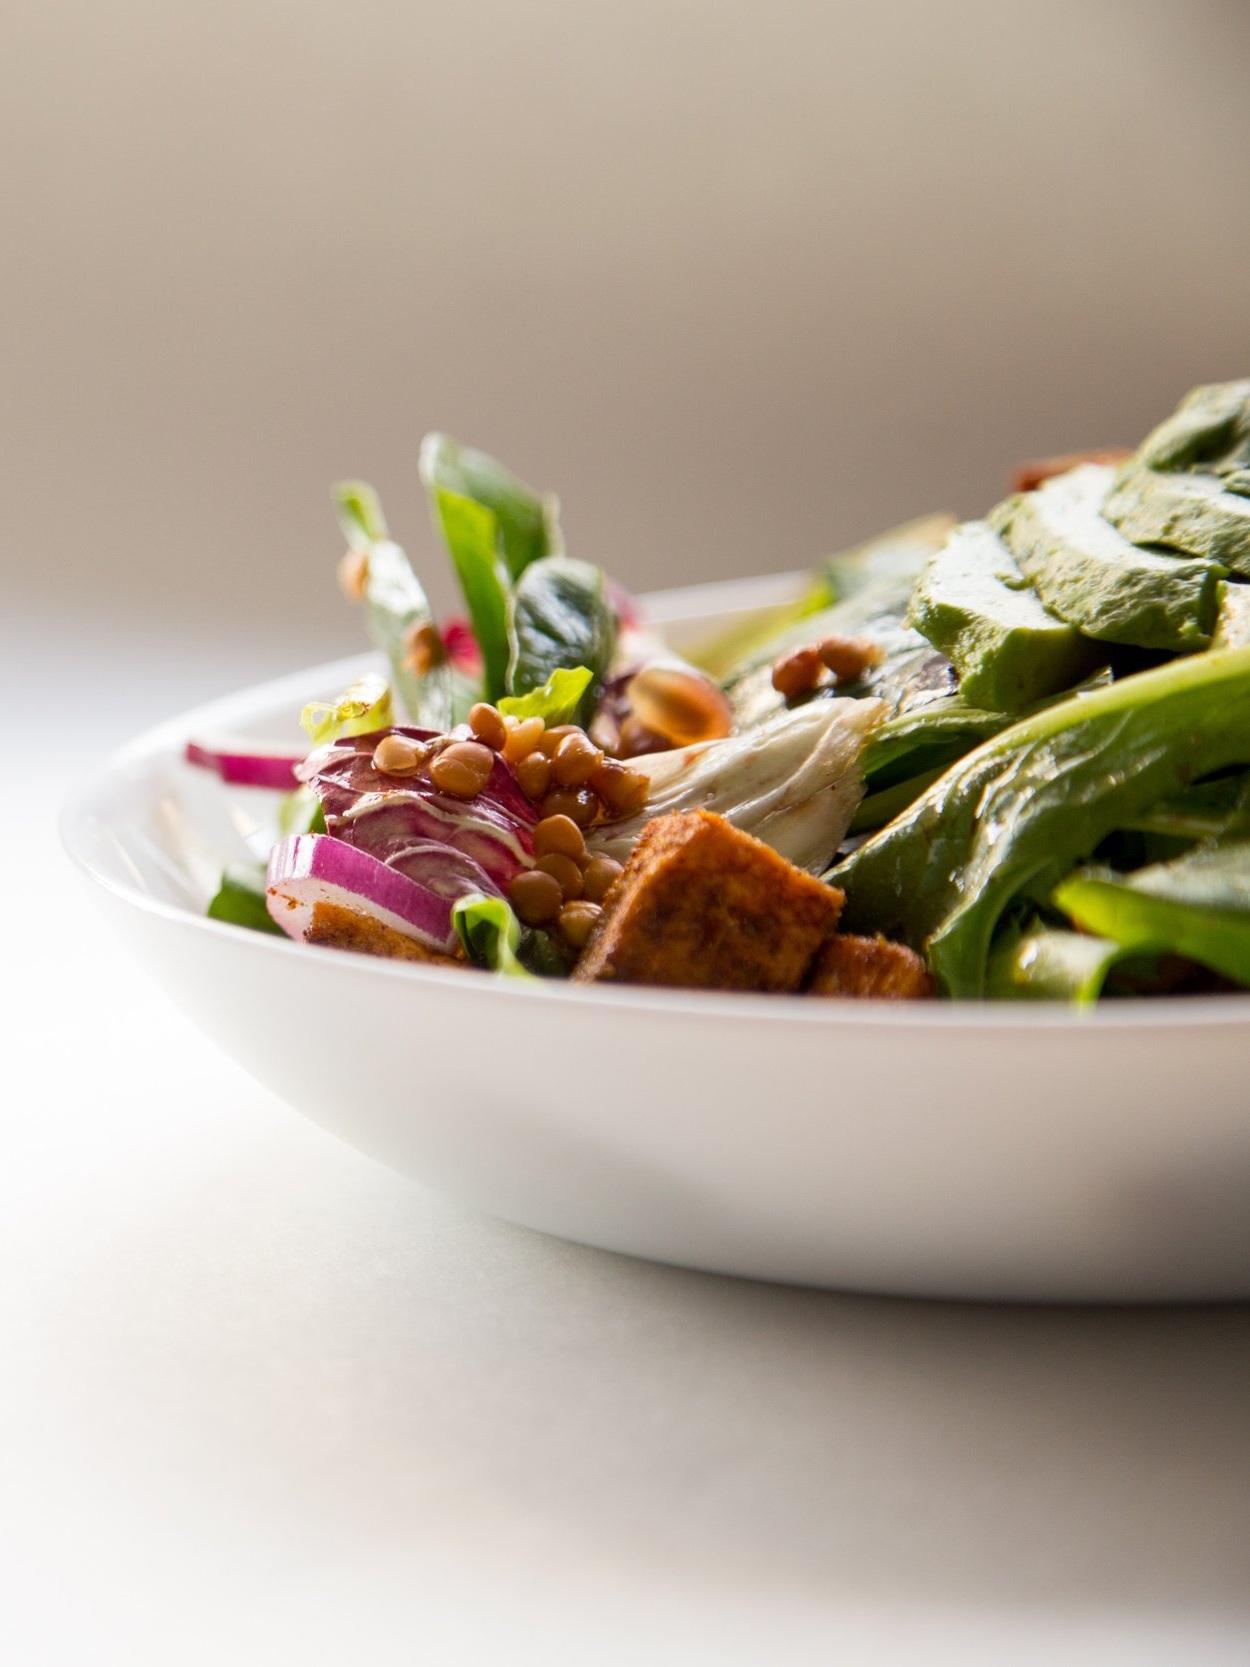 Mein Mittagessen heute - VOLLKORNREIS(Kohlenhydrate)BROKKOLI, GURKE, BLATTSALAT(grünes Gemüse)PAPRIKA(Kohlenhydrate)GERÄUCHERTER TOFU(Proteine, i.w.S. Hülsenfrucht)KICHERERBSEN(Hülsenfrucht, ProteineTOMATENMARK(Kohlenhydrate)SESAMMUS(Fette)